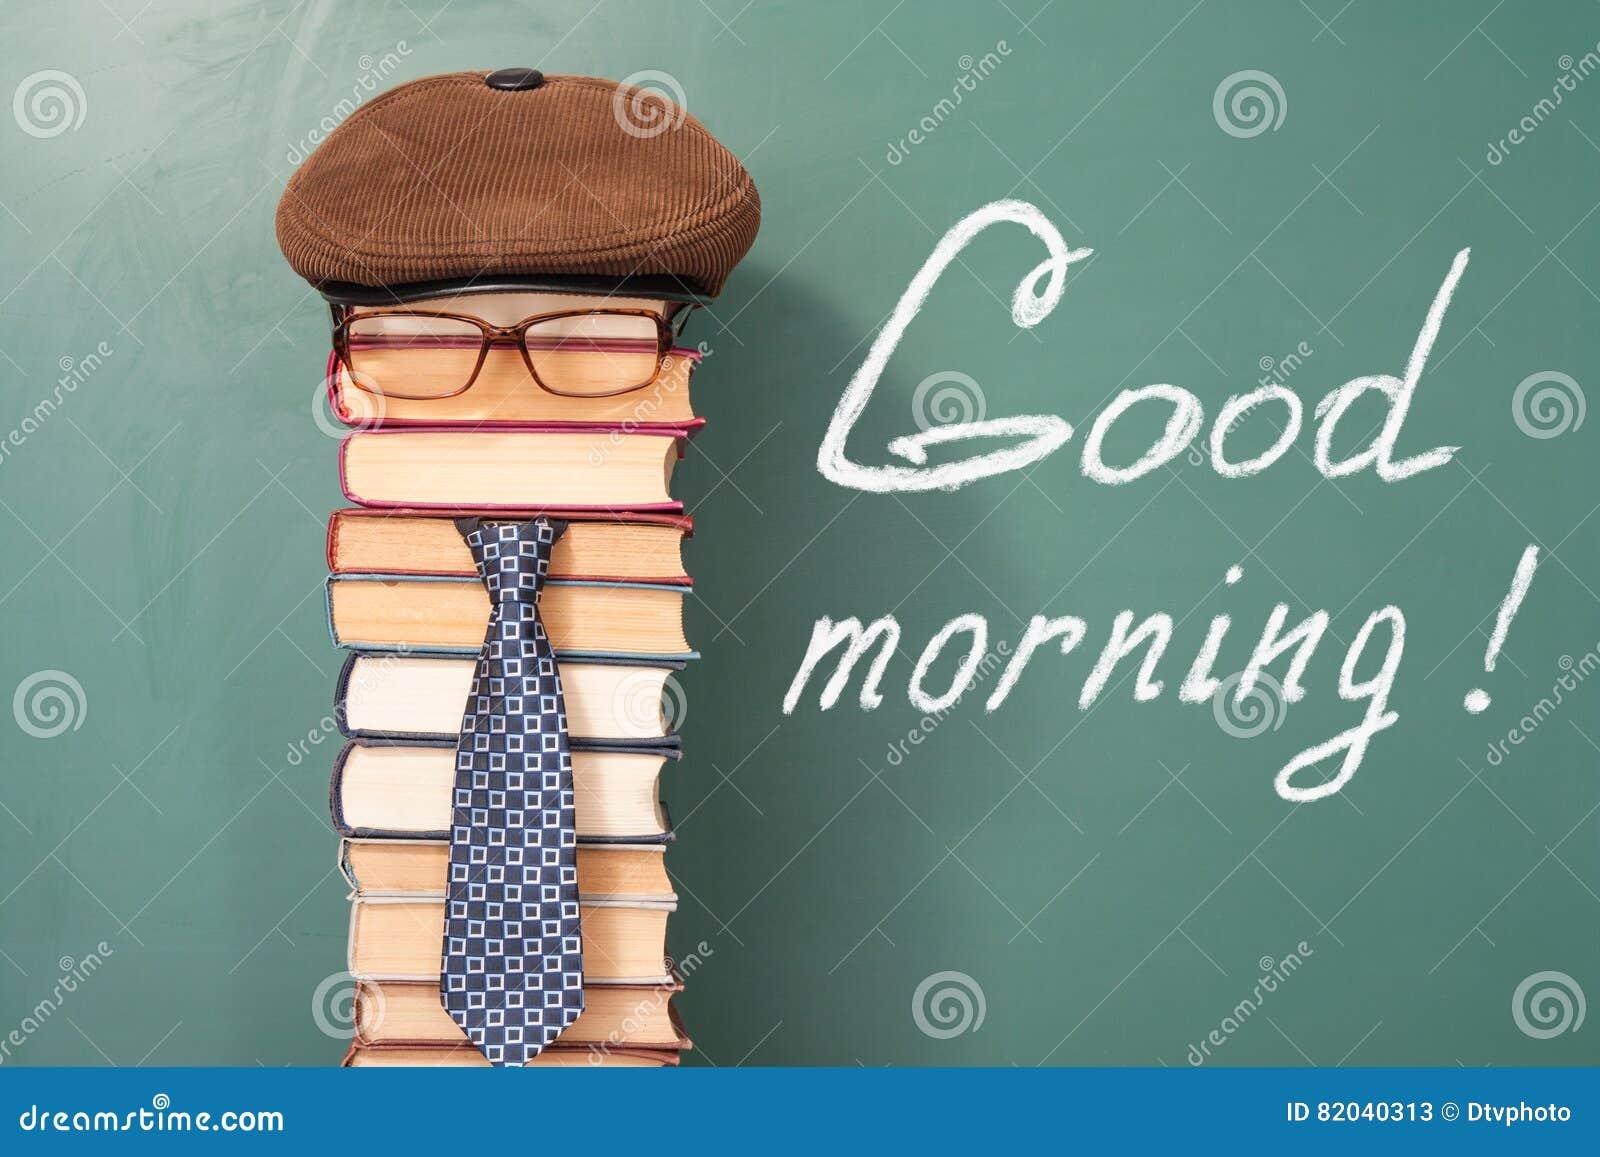 Guten Morgen!